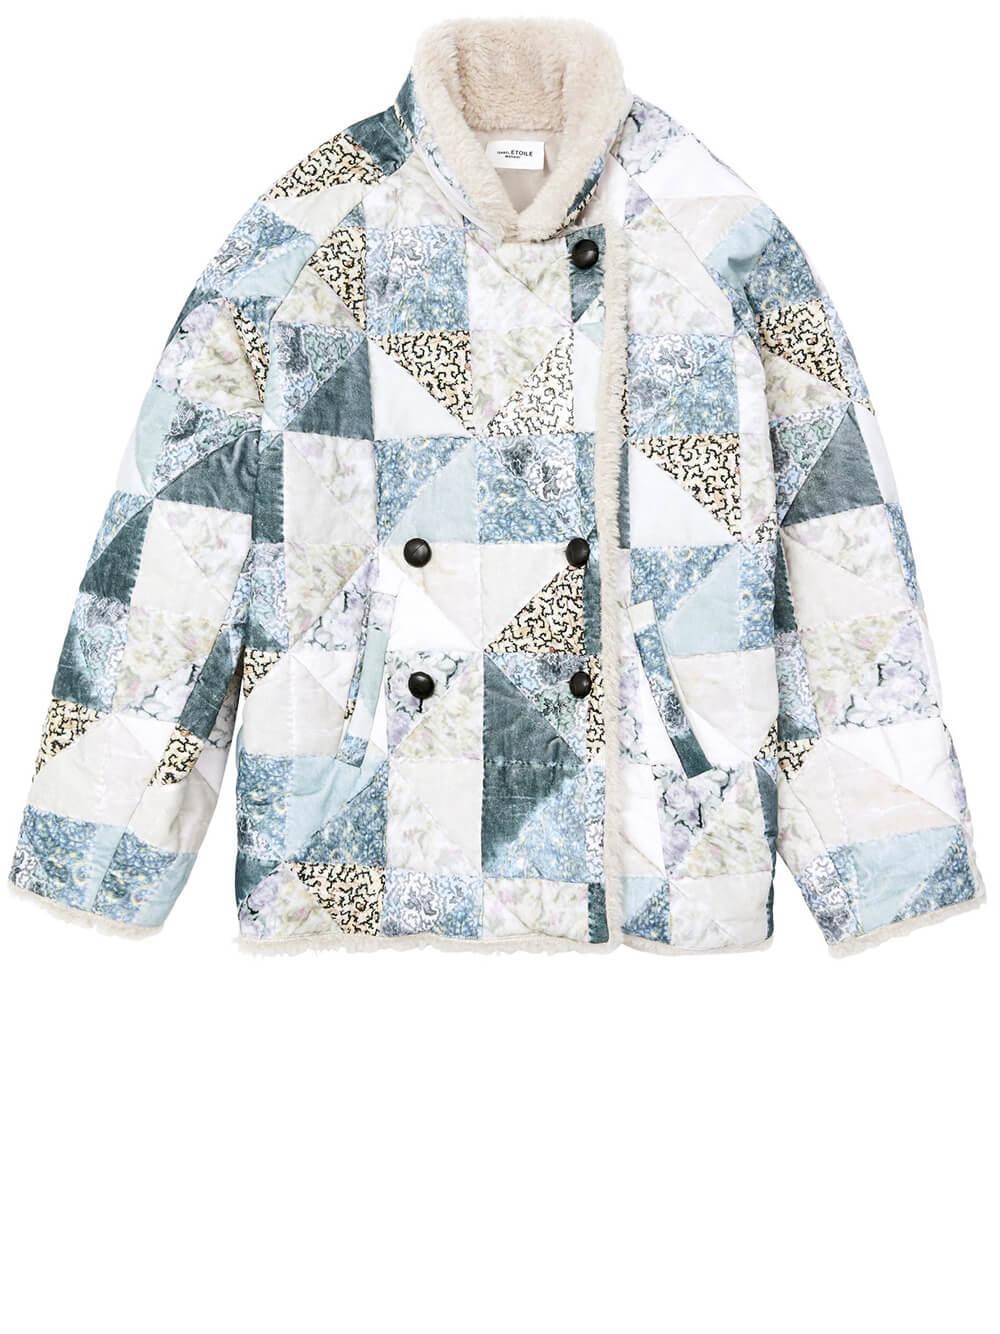 Maceio Patchwork Jacket Item # 20AMA0765-20A019E